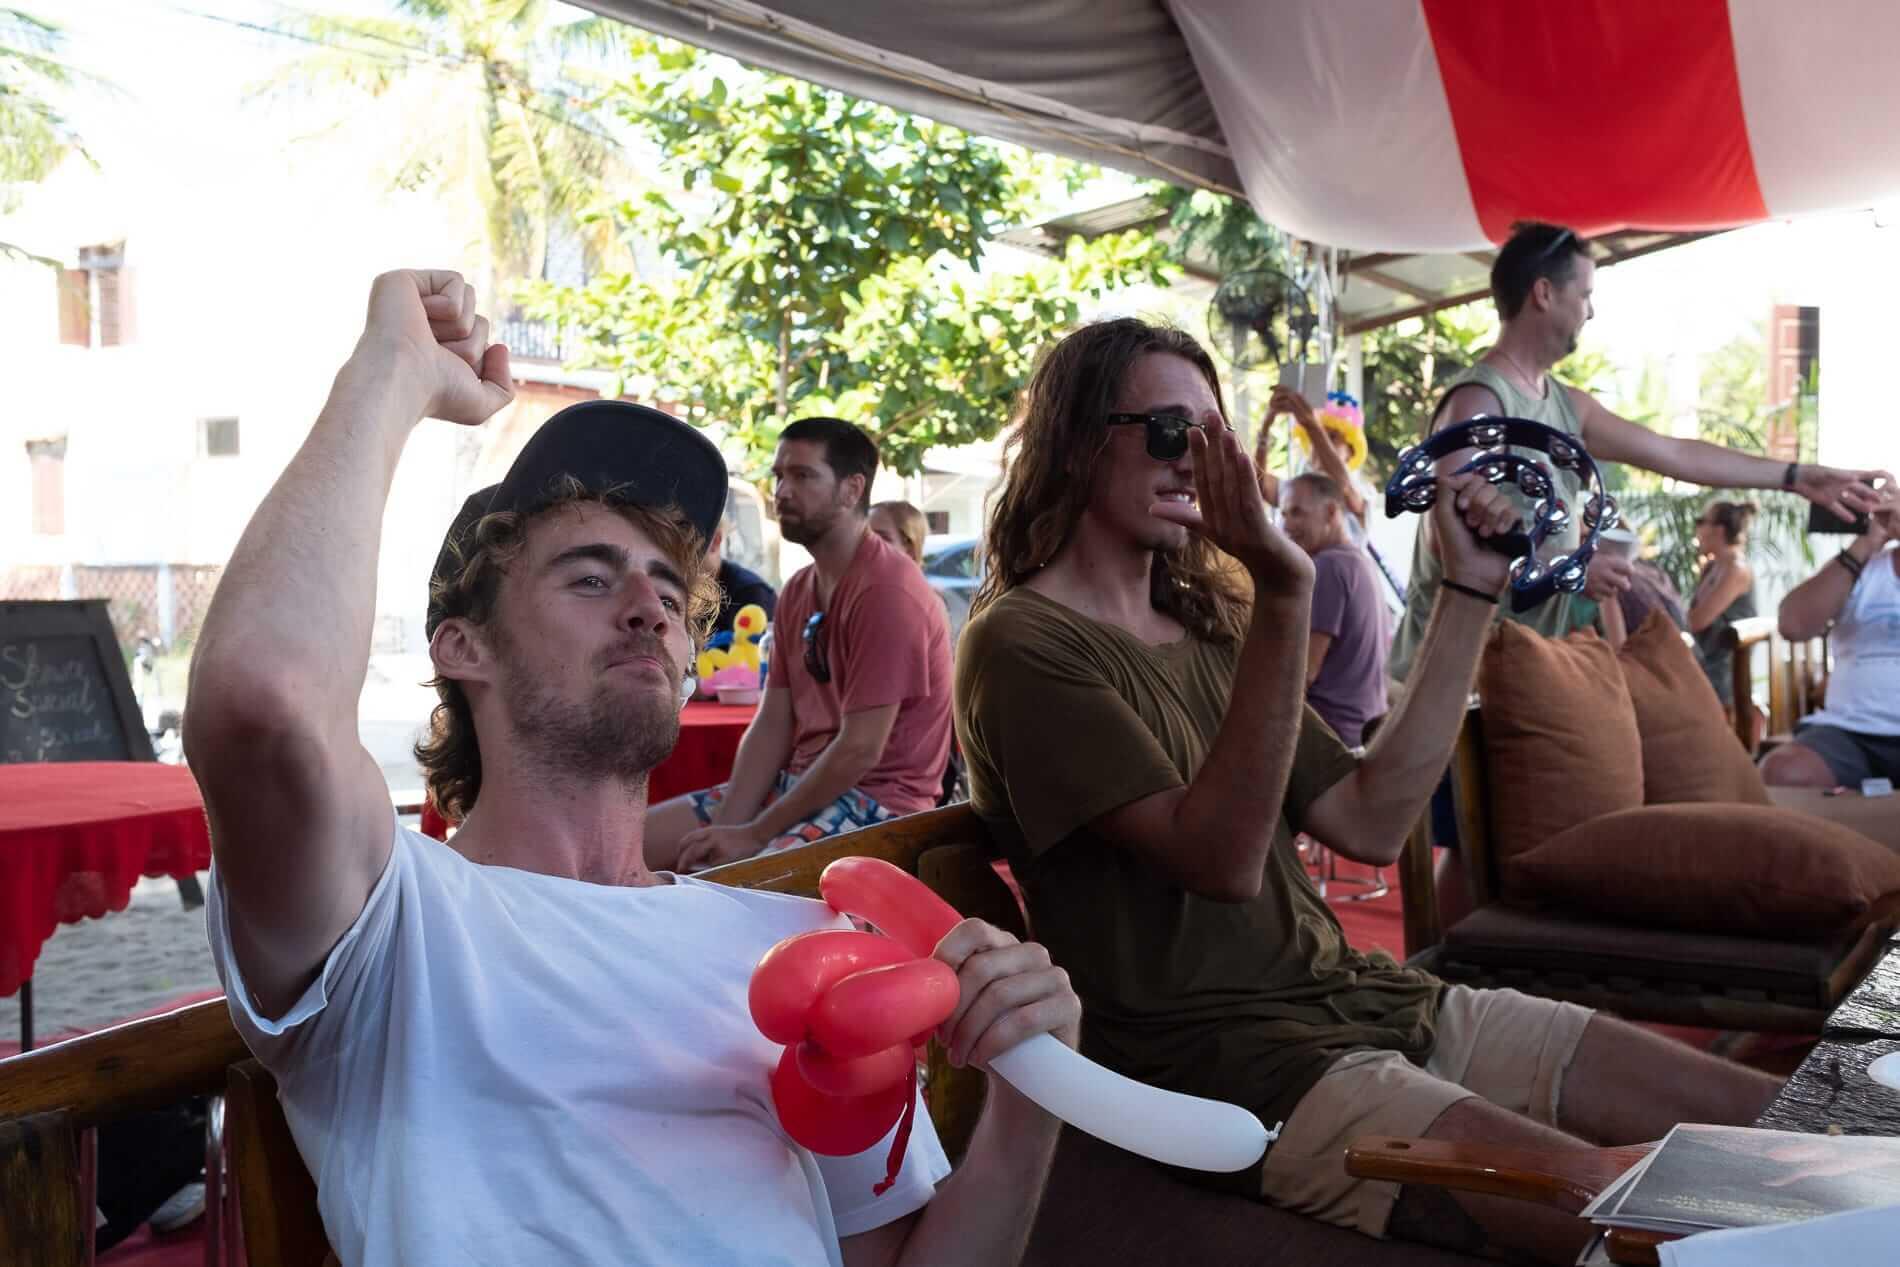 Celebration in Hoi An